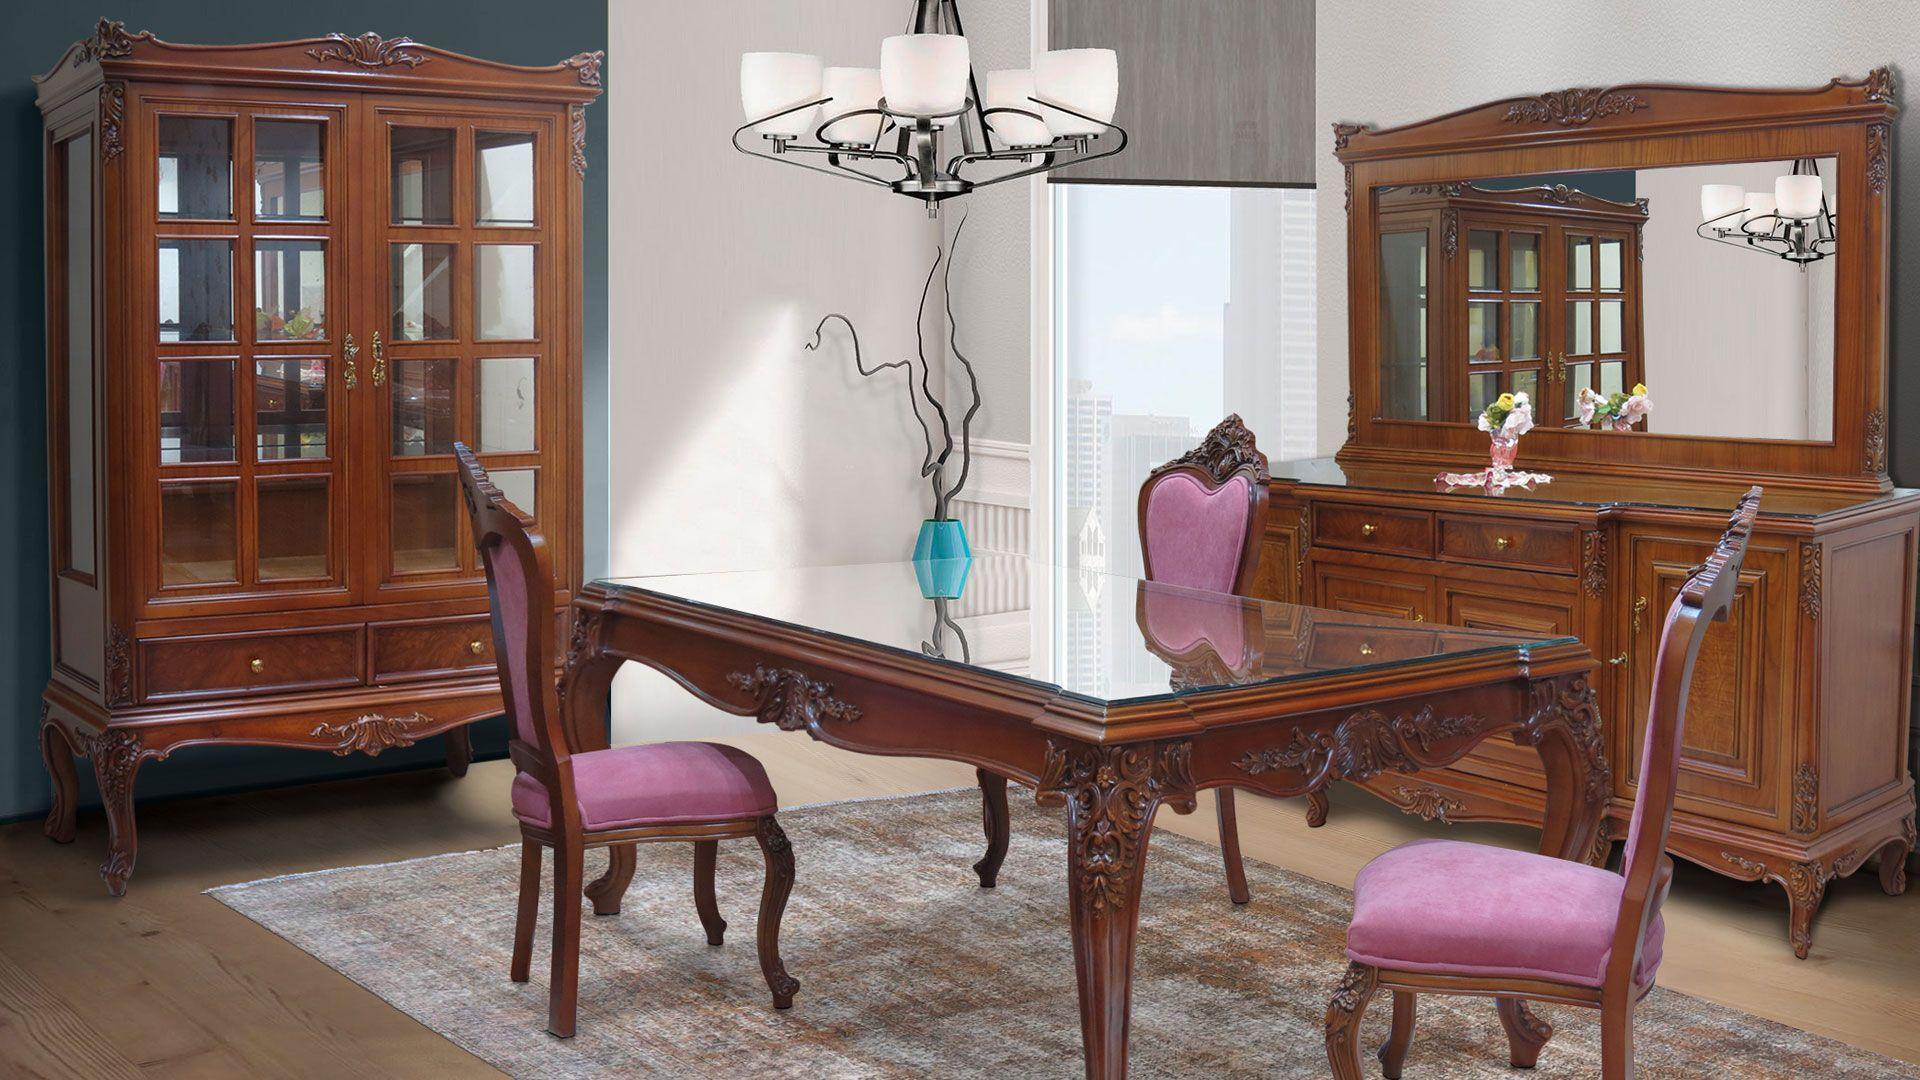 غرفة سفرة كلاسيك Ramona Classic Dining Room Room Furniture